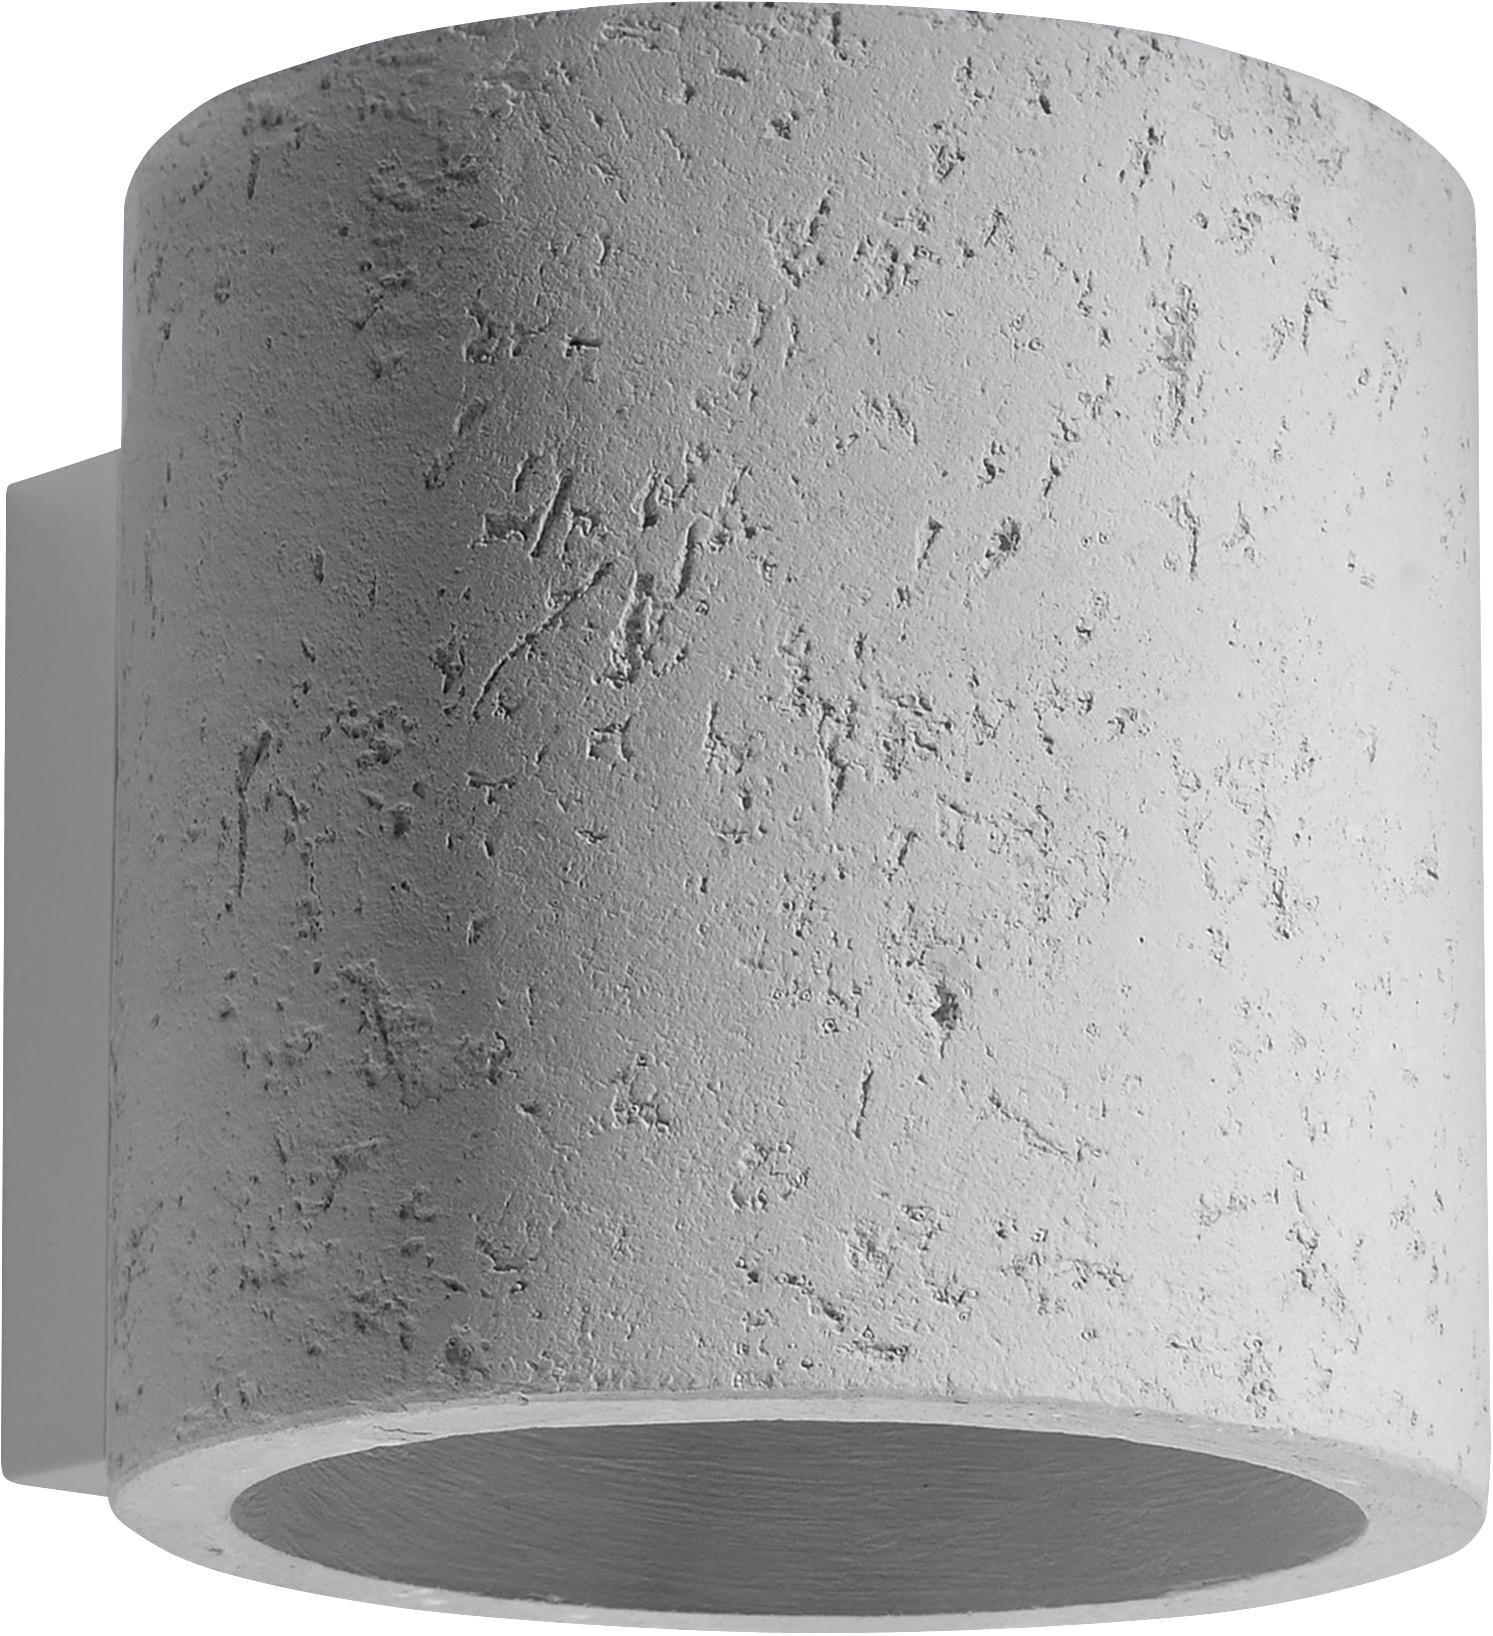 Applique Roda, Cemento, Bianco latte, Ø 10 x A 12 cm